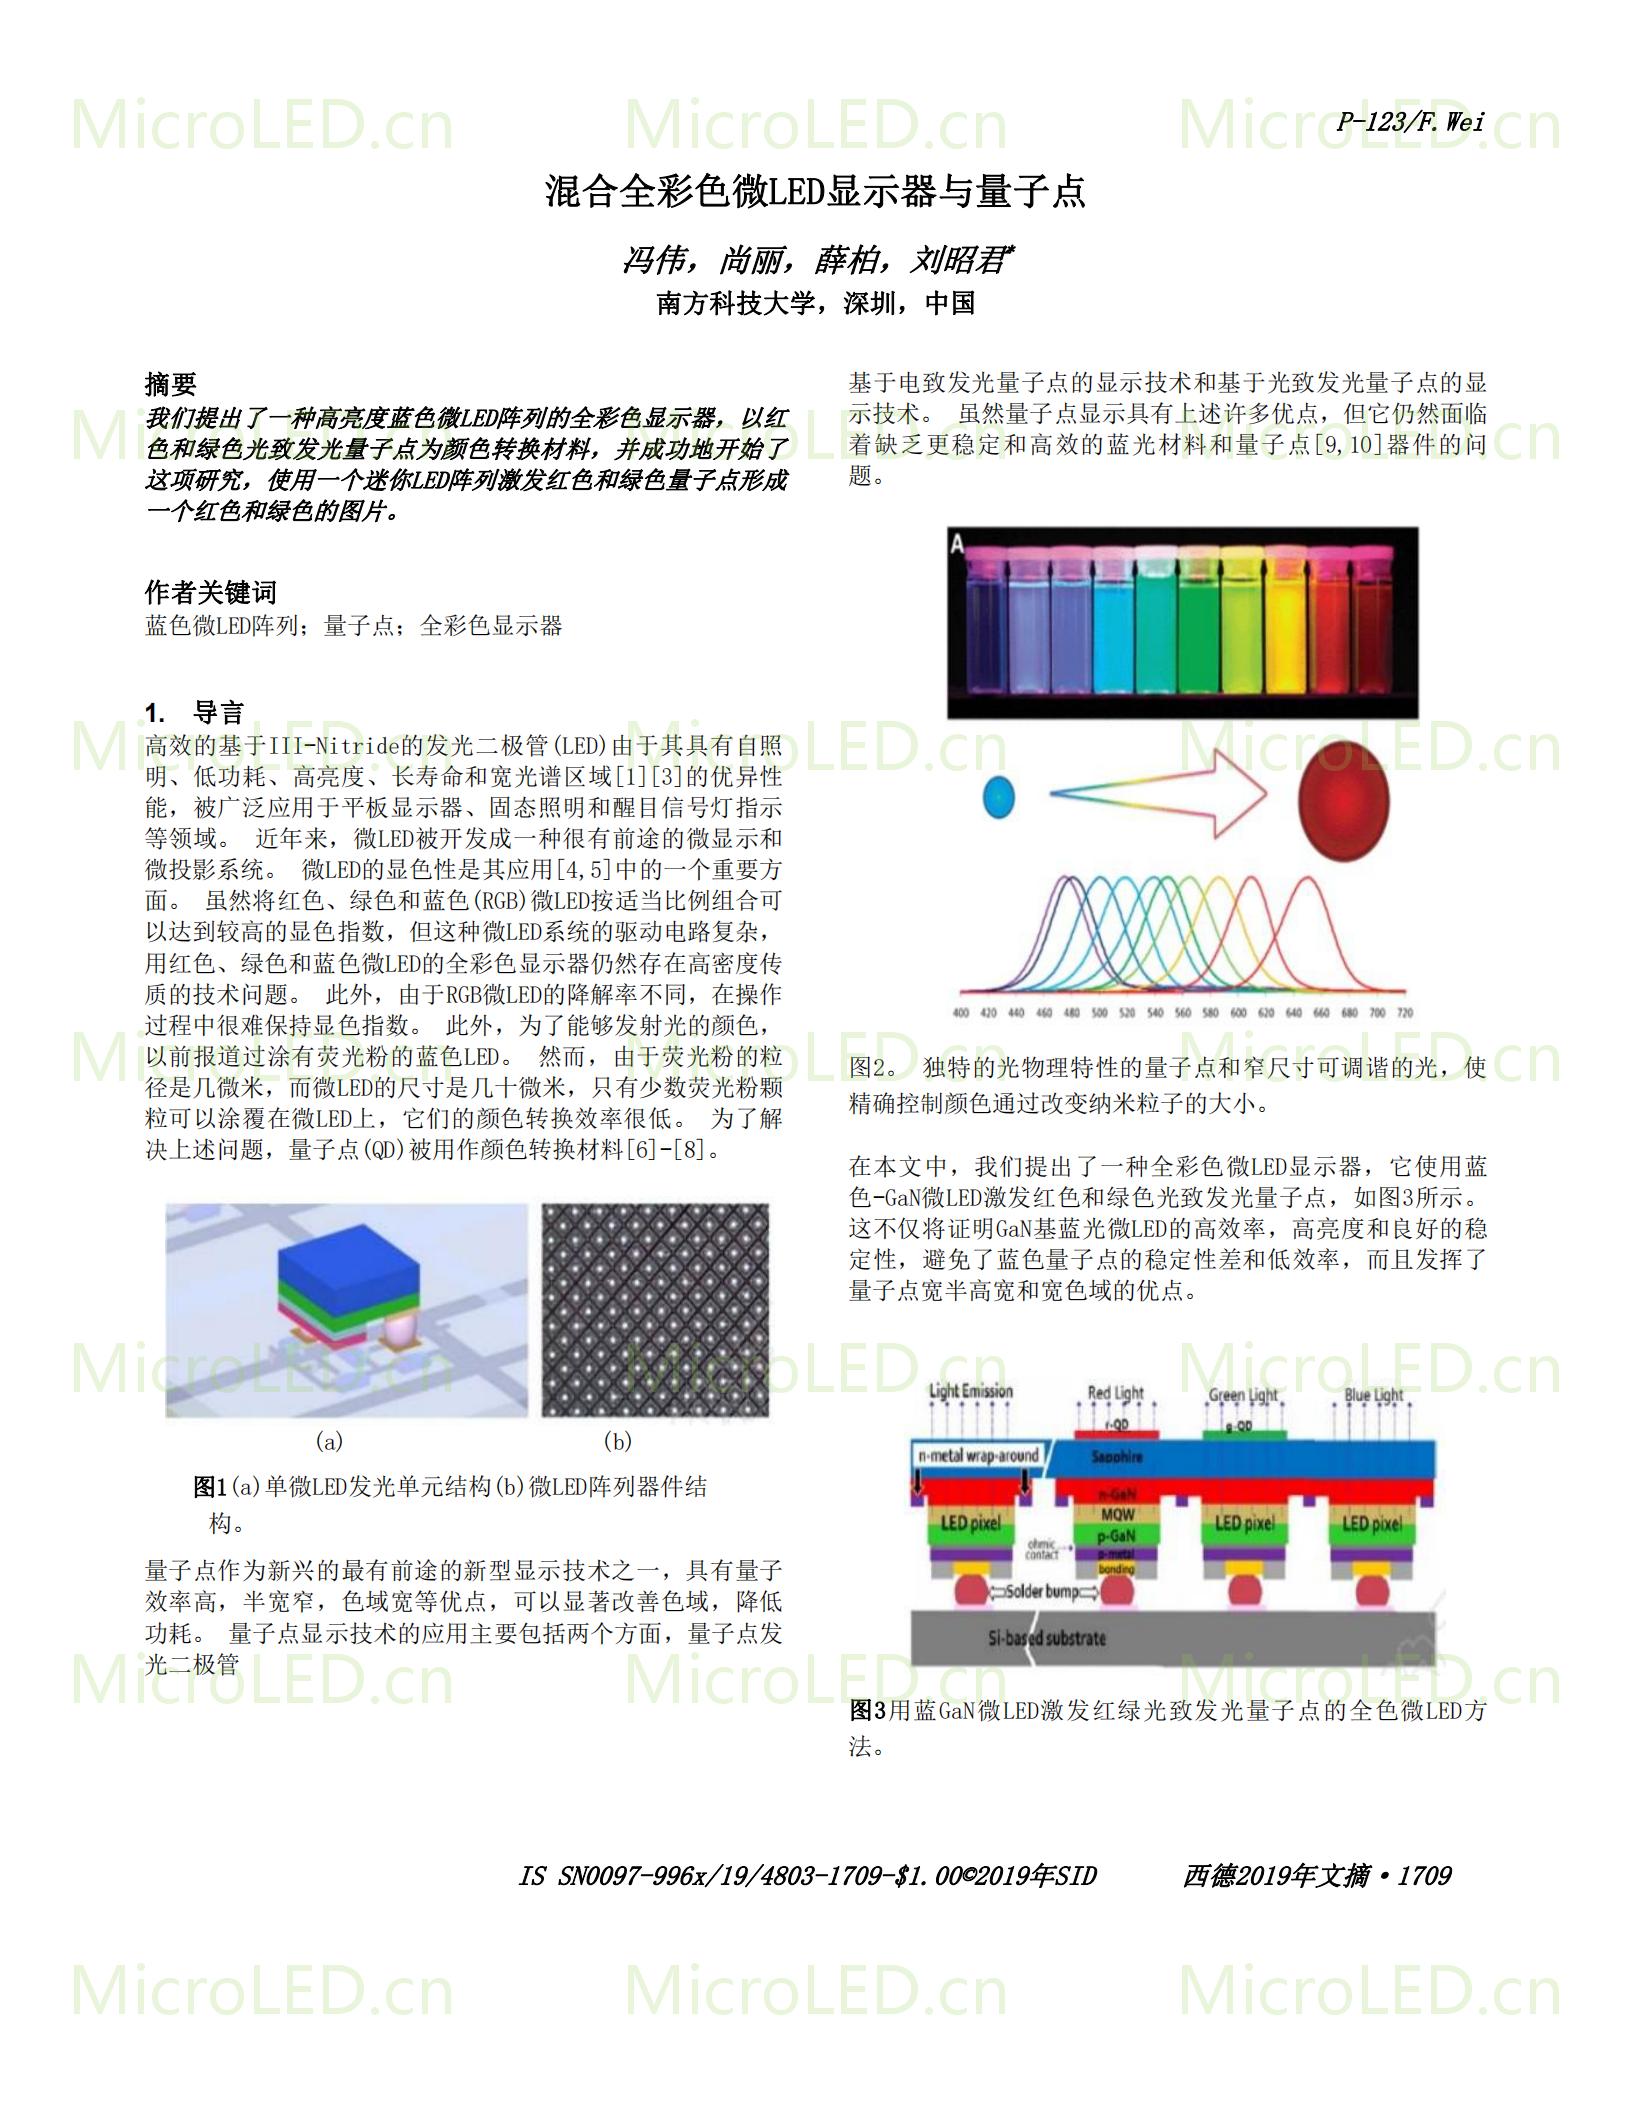 混合全彩色MicroLED显示器与量子点  第1张